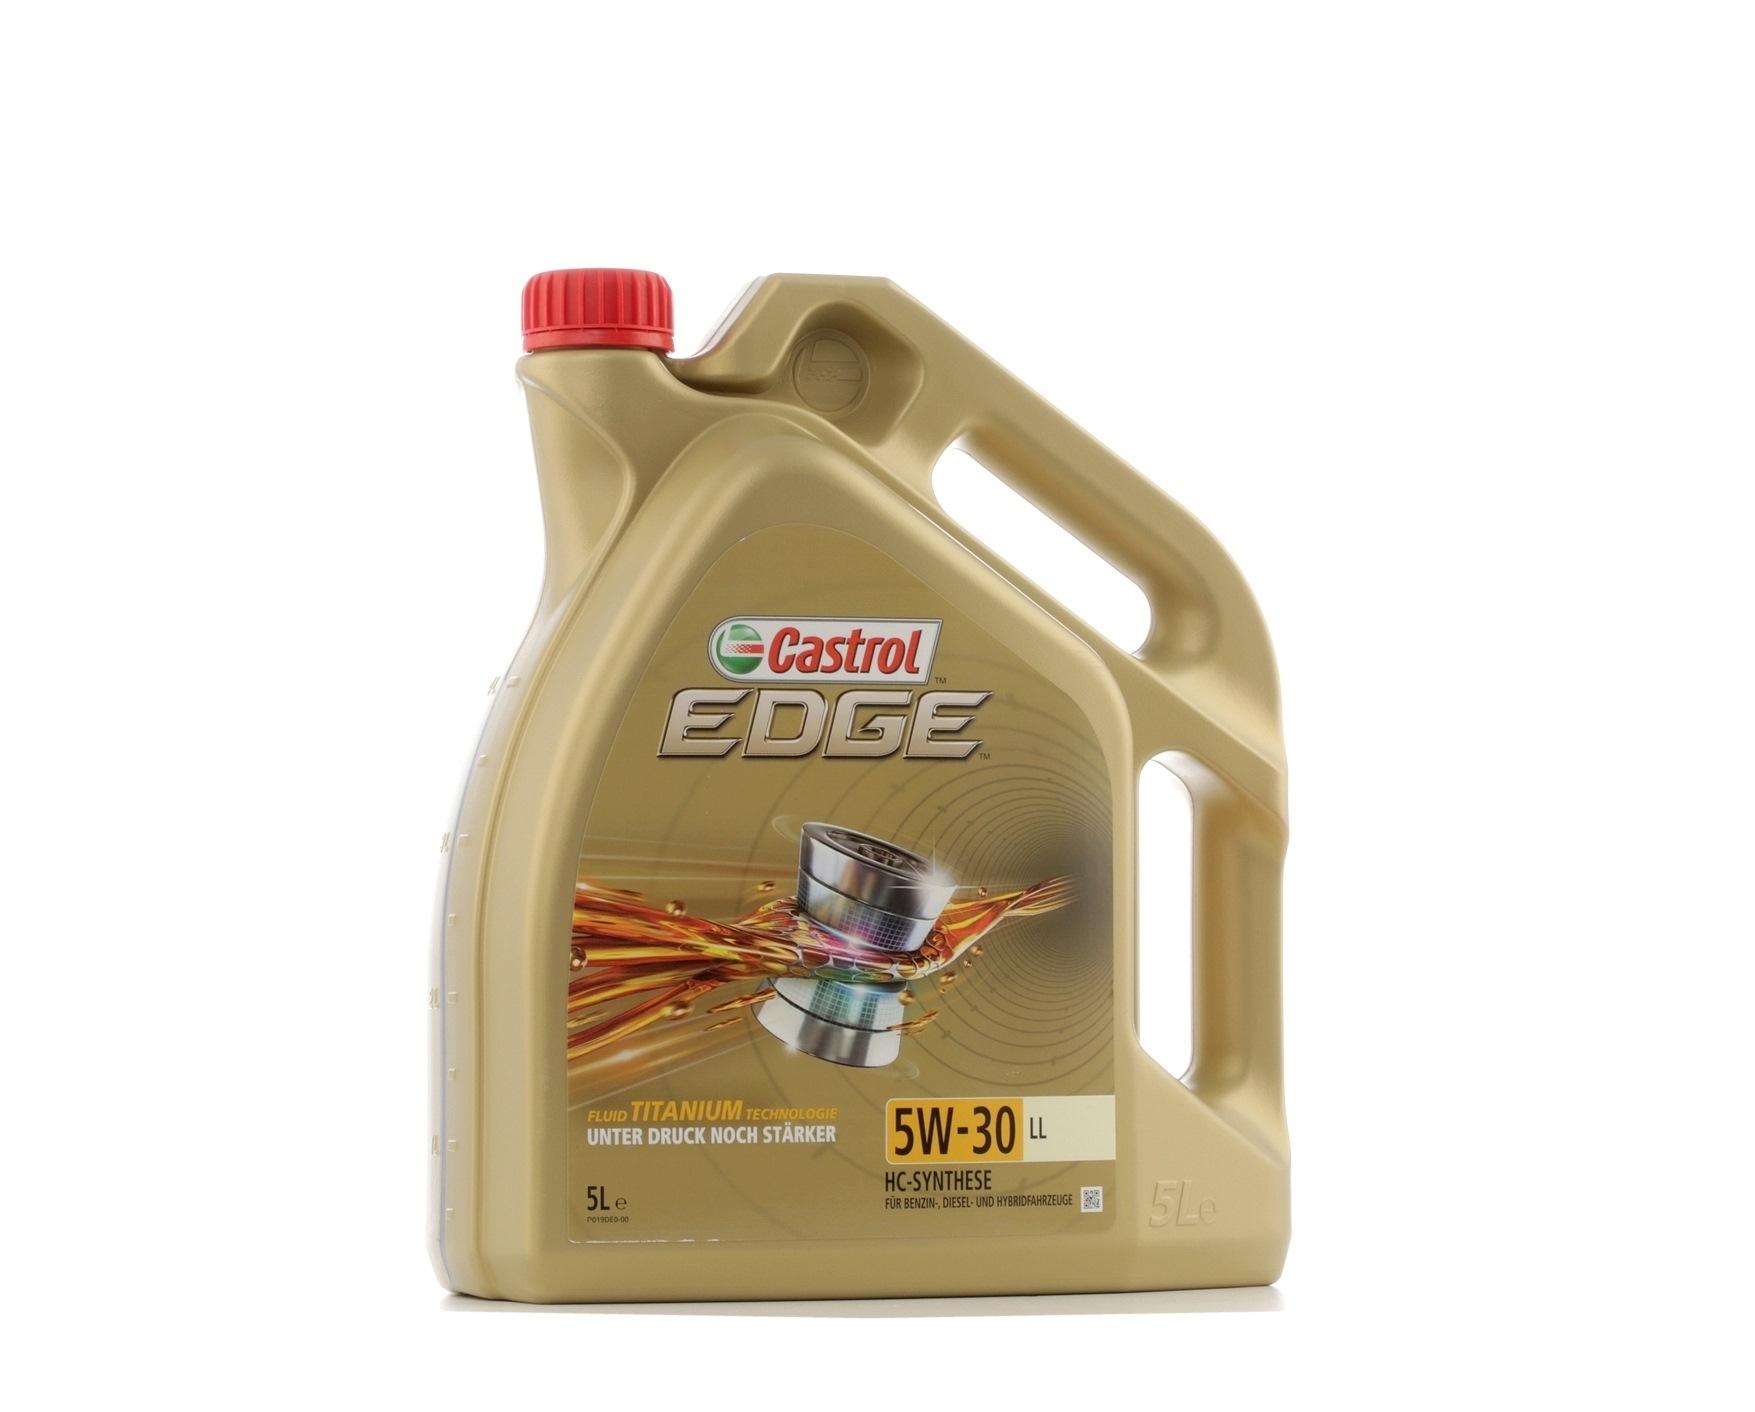 ACEALightDutyC3 CASTROL EDGE, LL 5W-30, 5l, Synthetiköl Motoröl 15669E kaufen